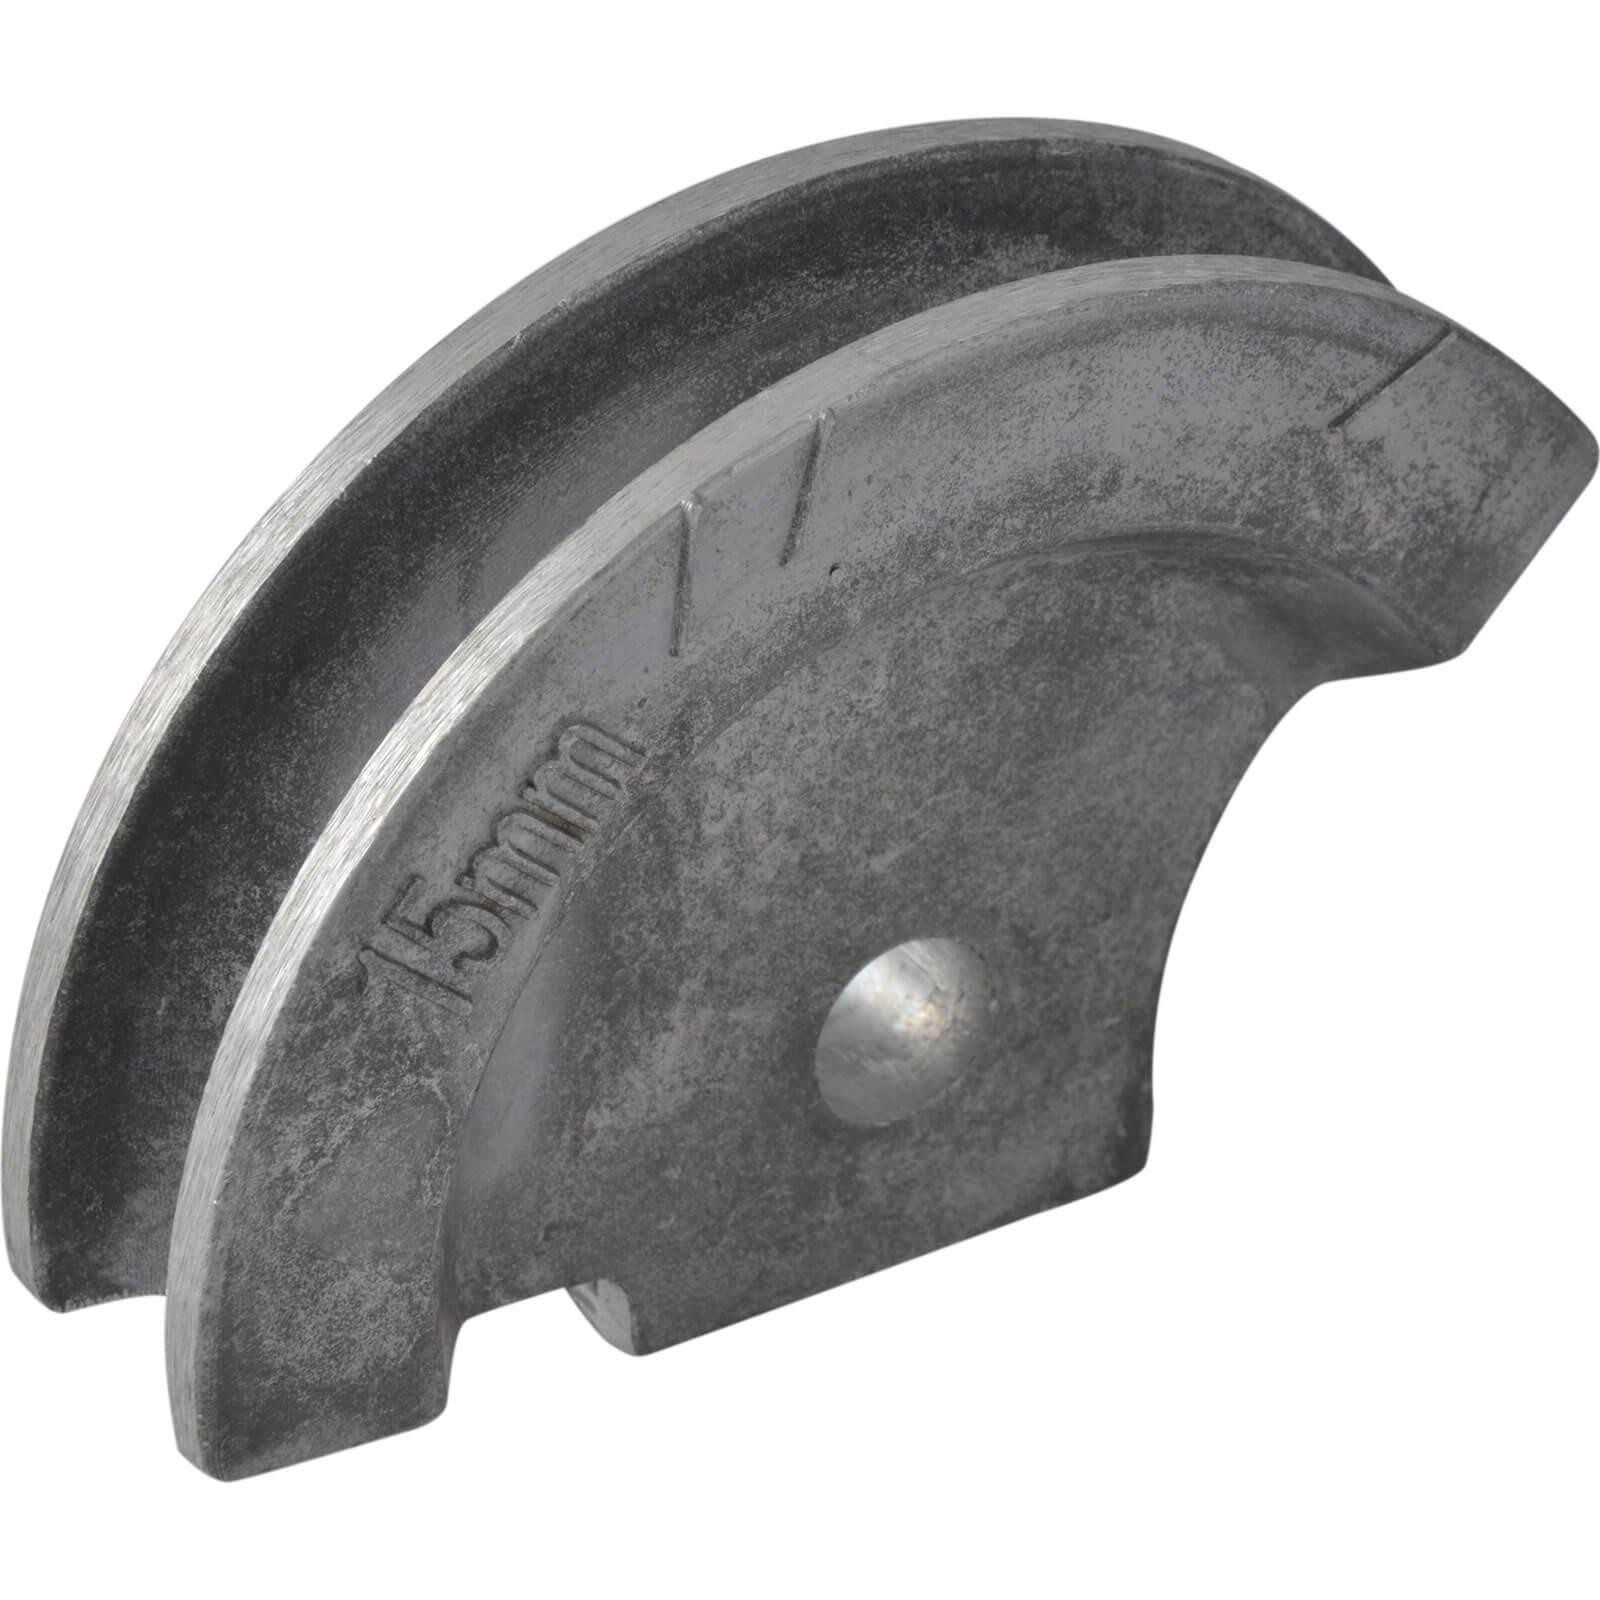 Image of Hilmor Aluminum Former For GL Minor Pipe Bender 15mm